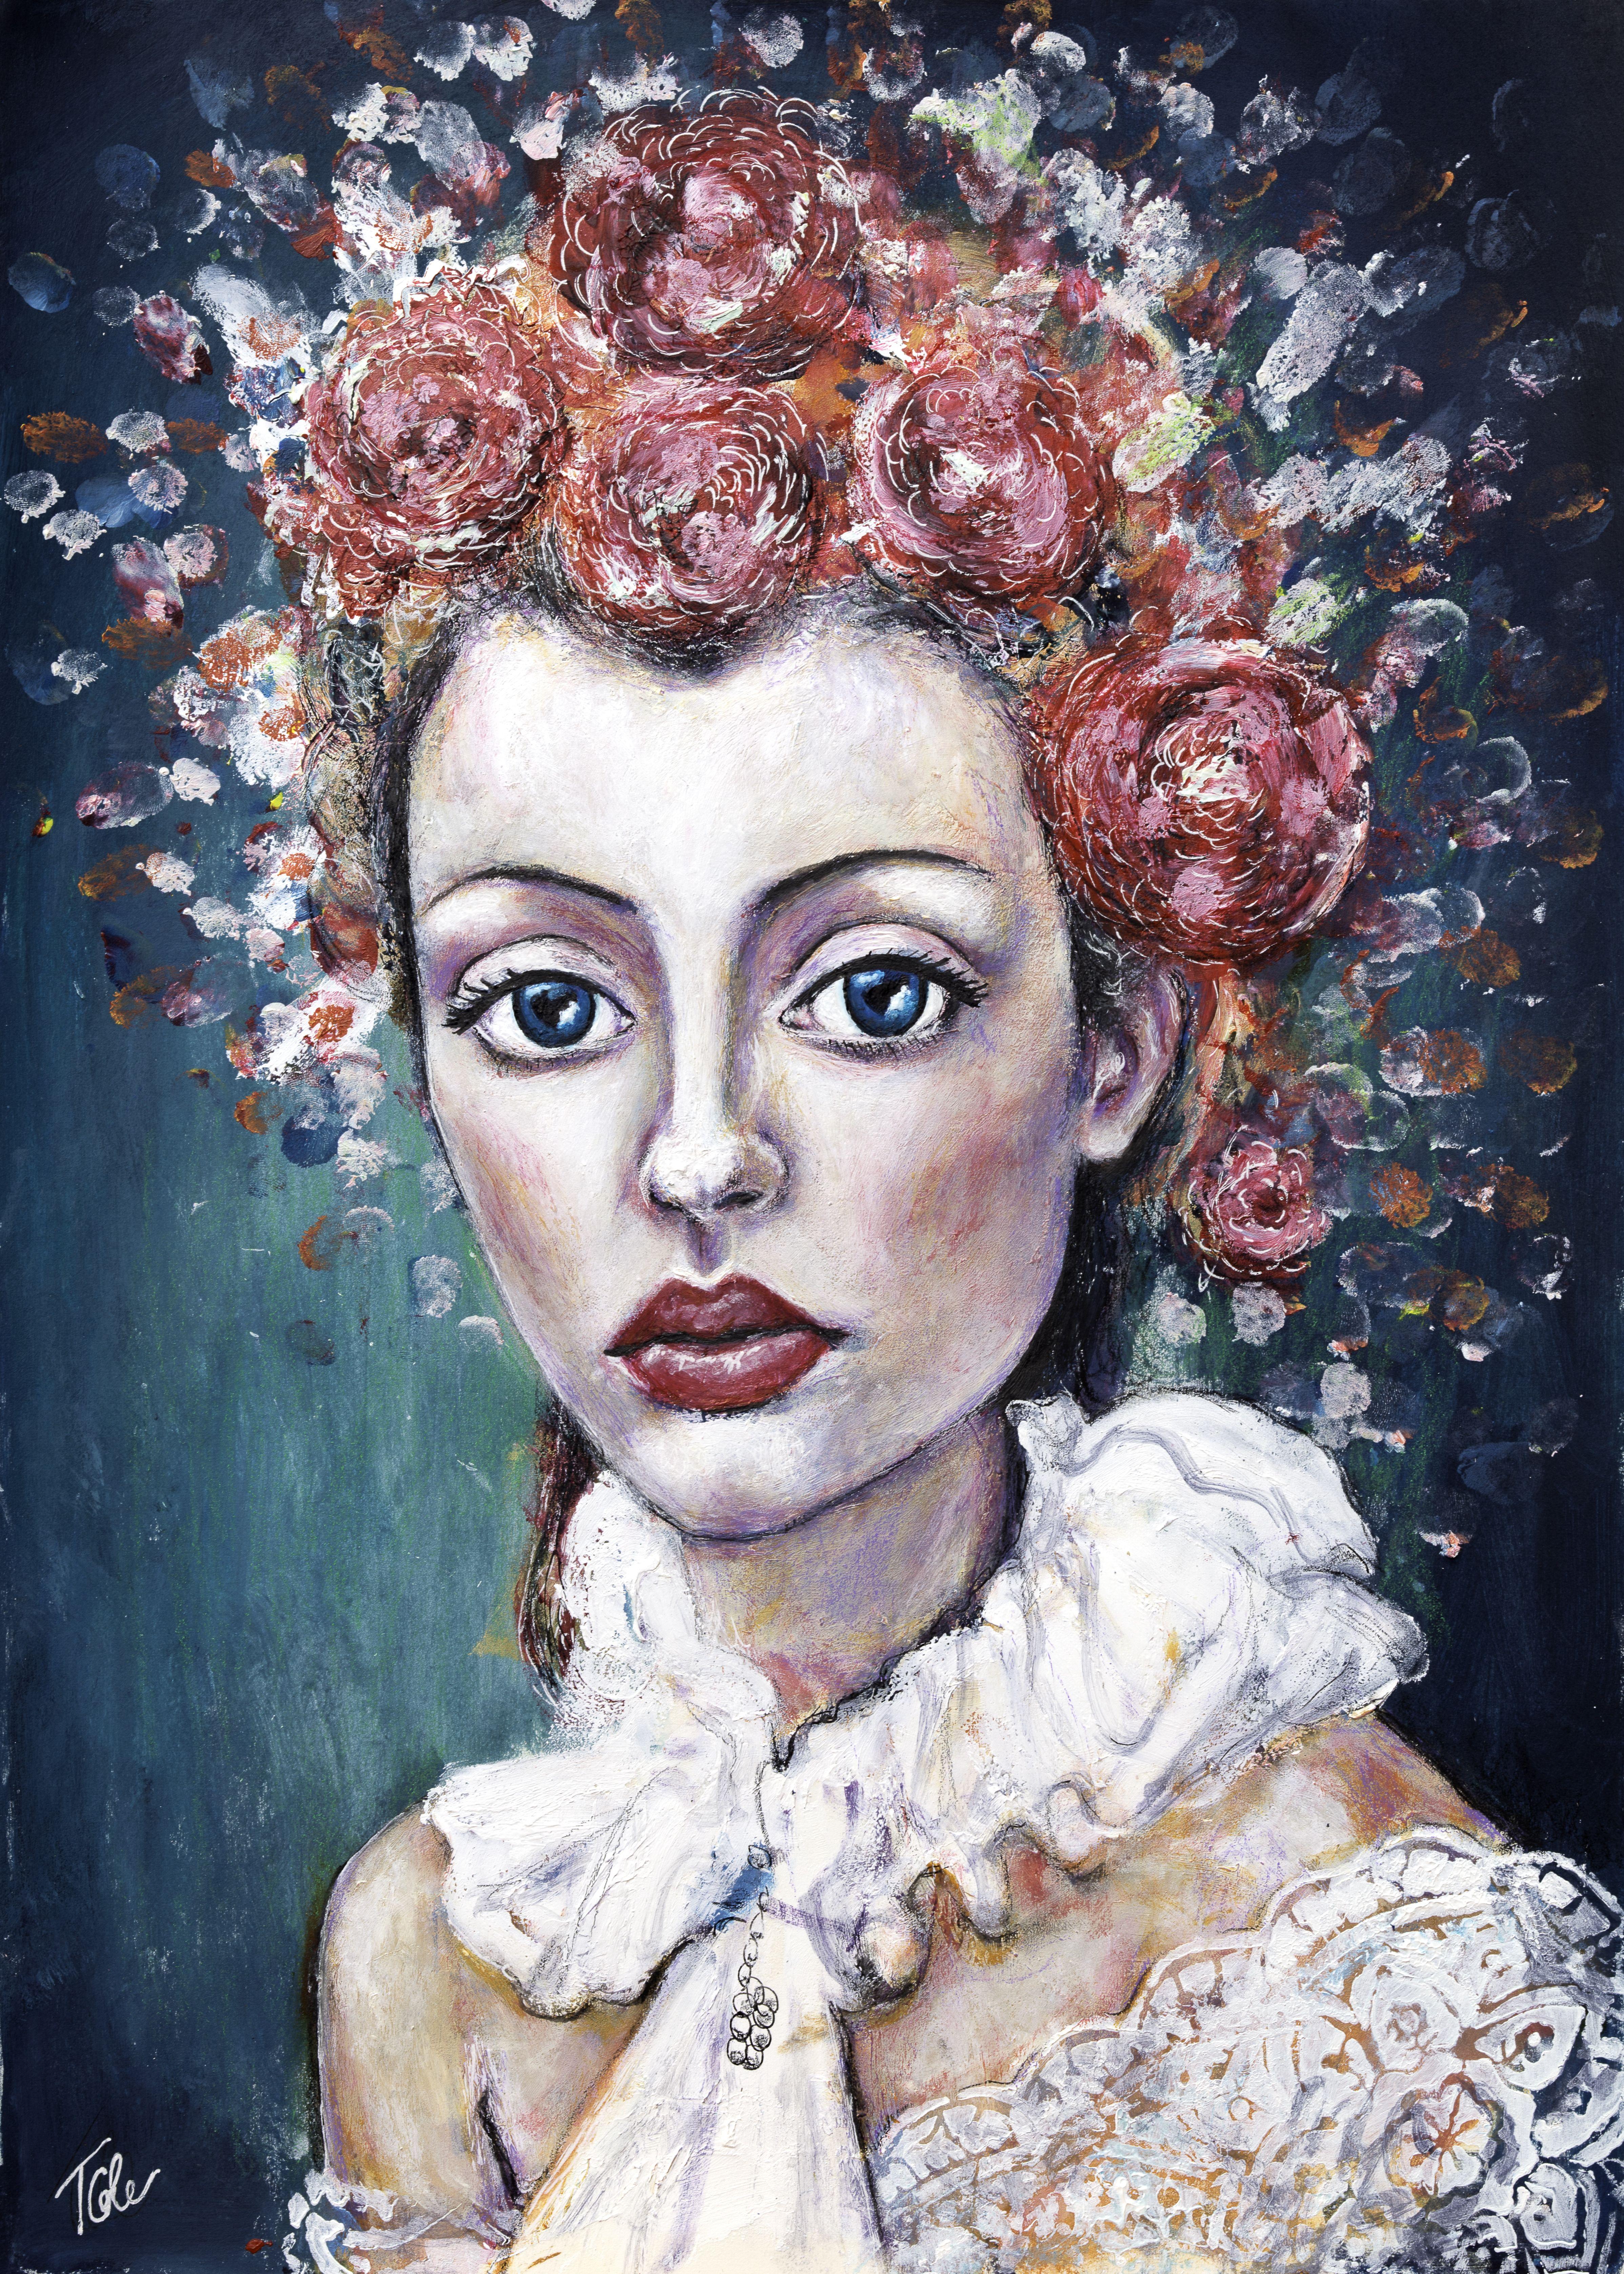 Stunning Homoerotic Artwork For Sale on Fine Art Prints